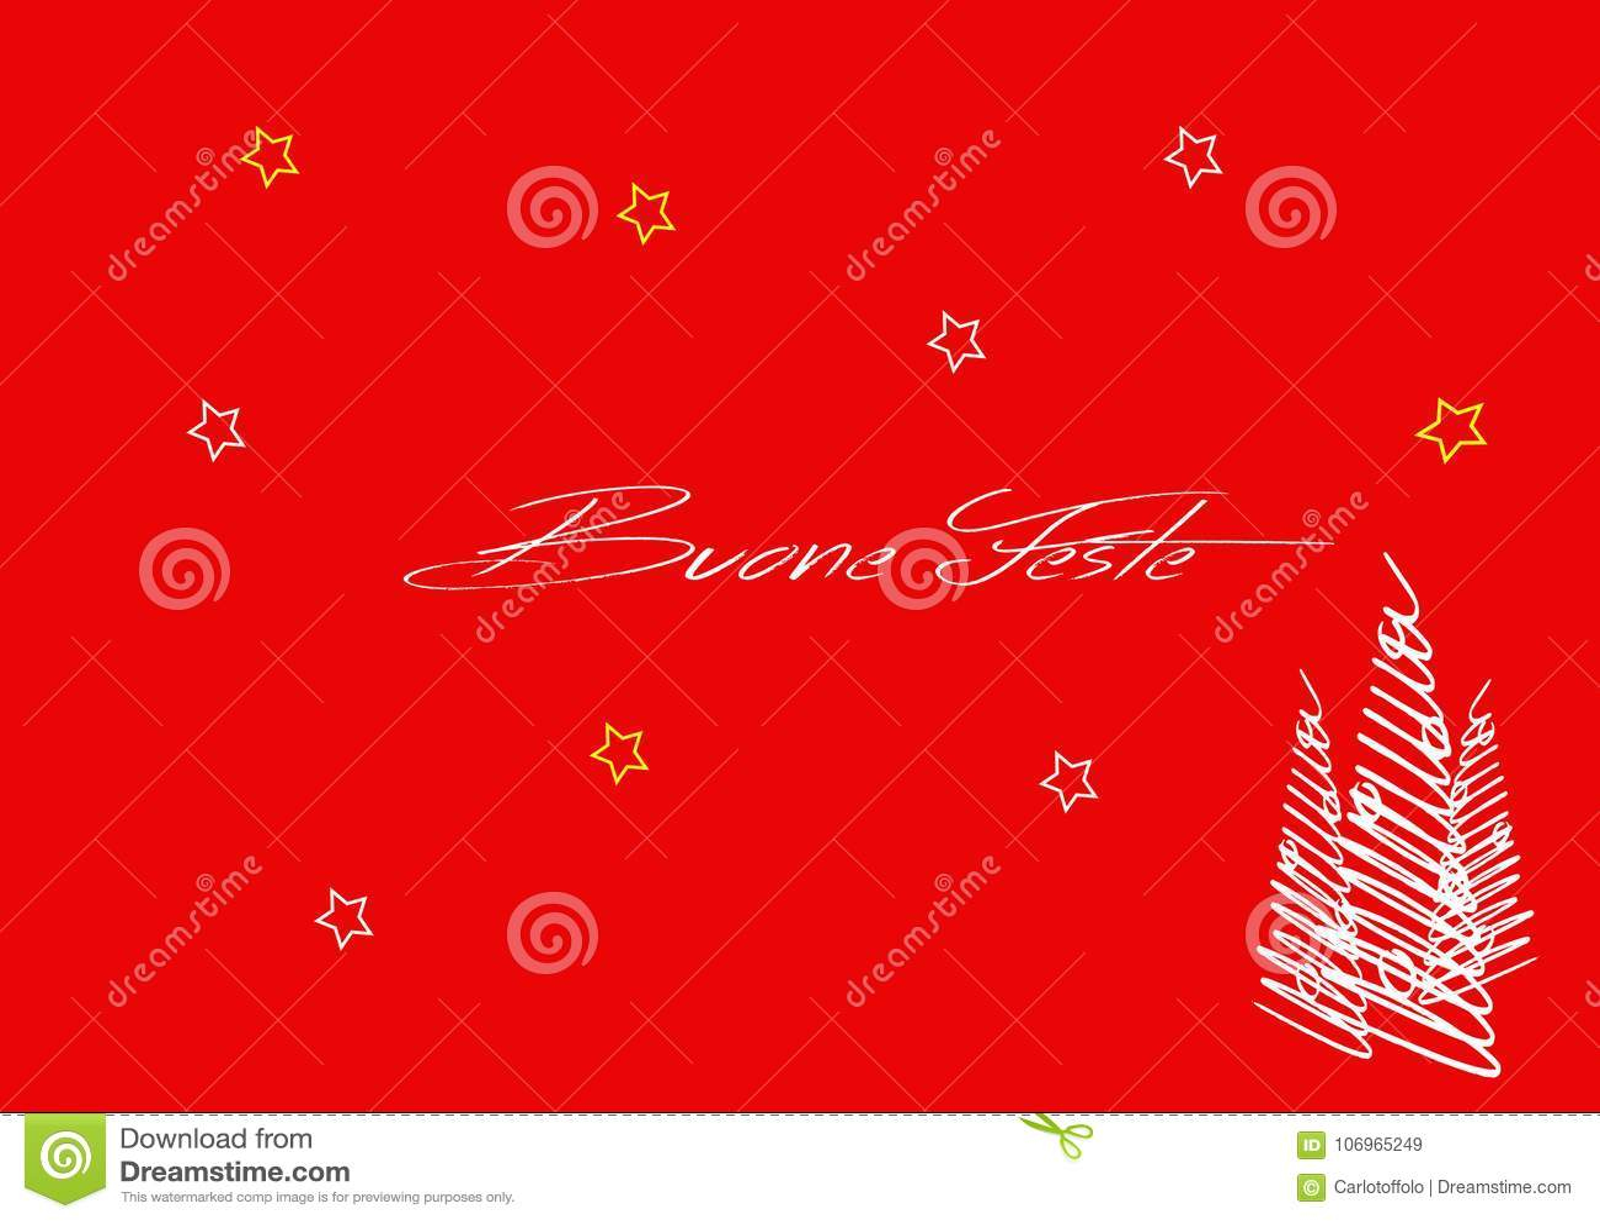 Buone Feste Greetings Card Italian Language Greetings Stock Vector